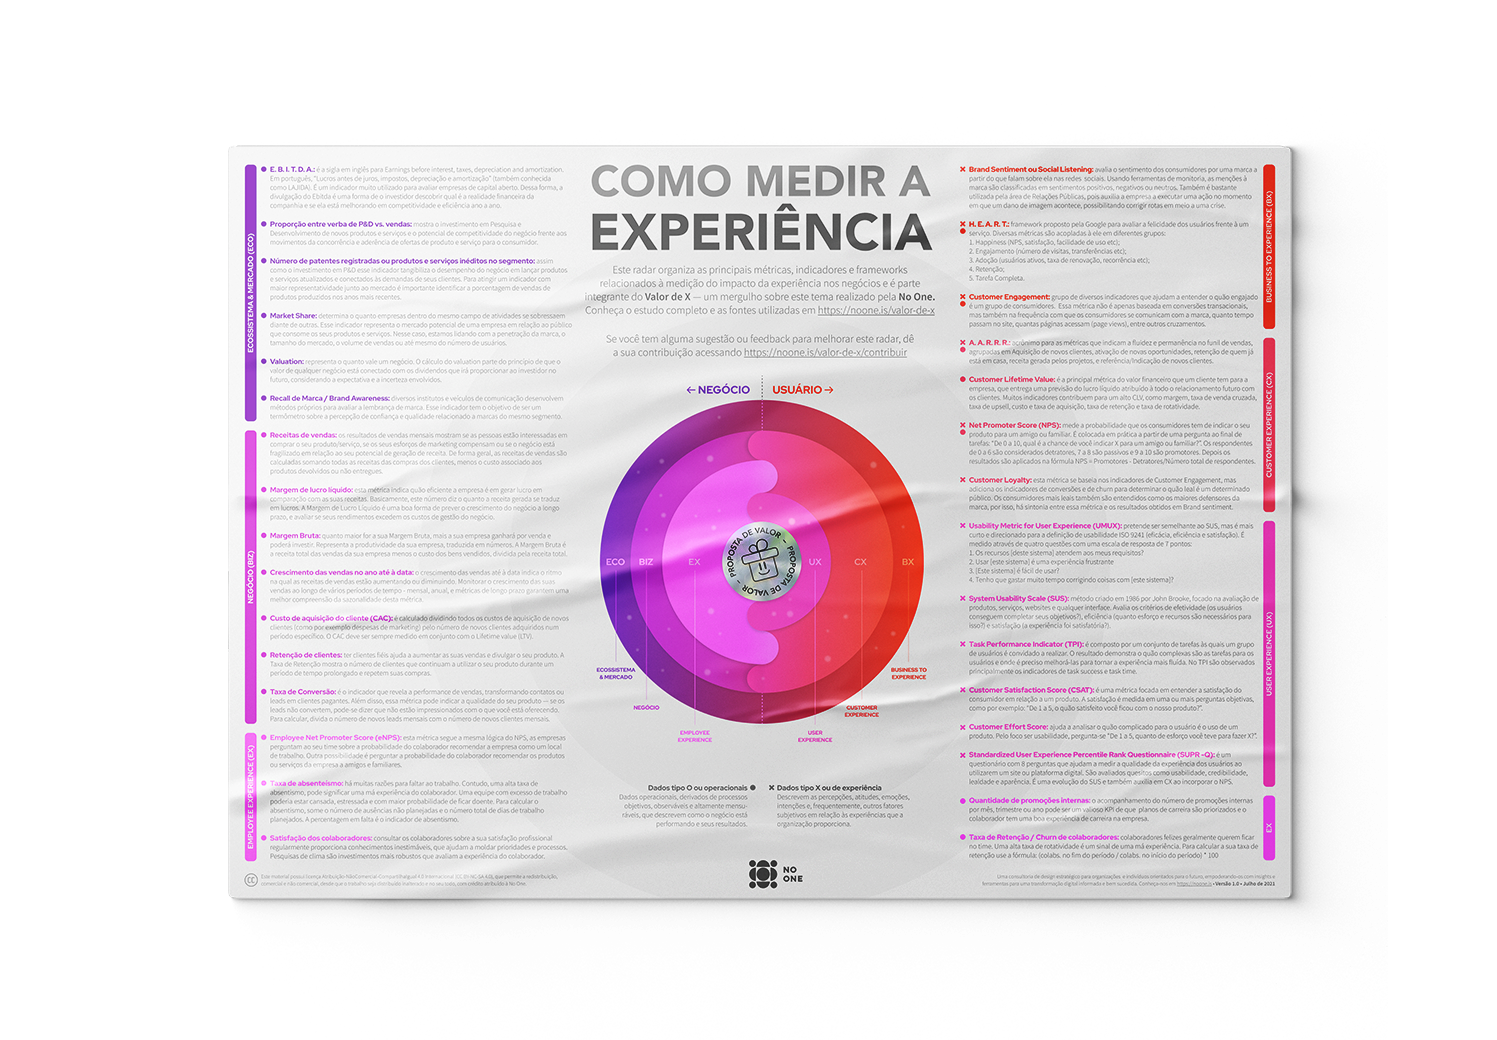 Como medir a experiência. Radar Valor de X